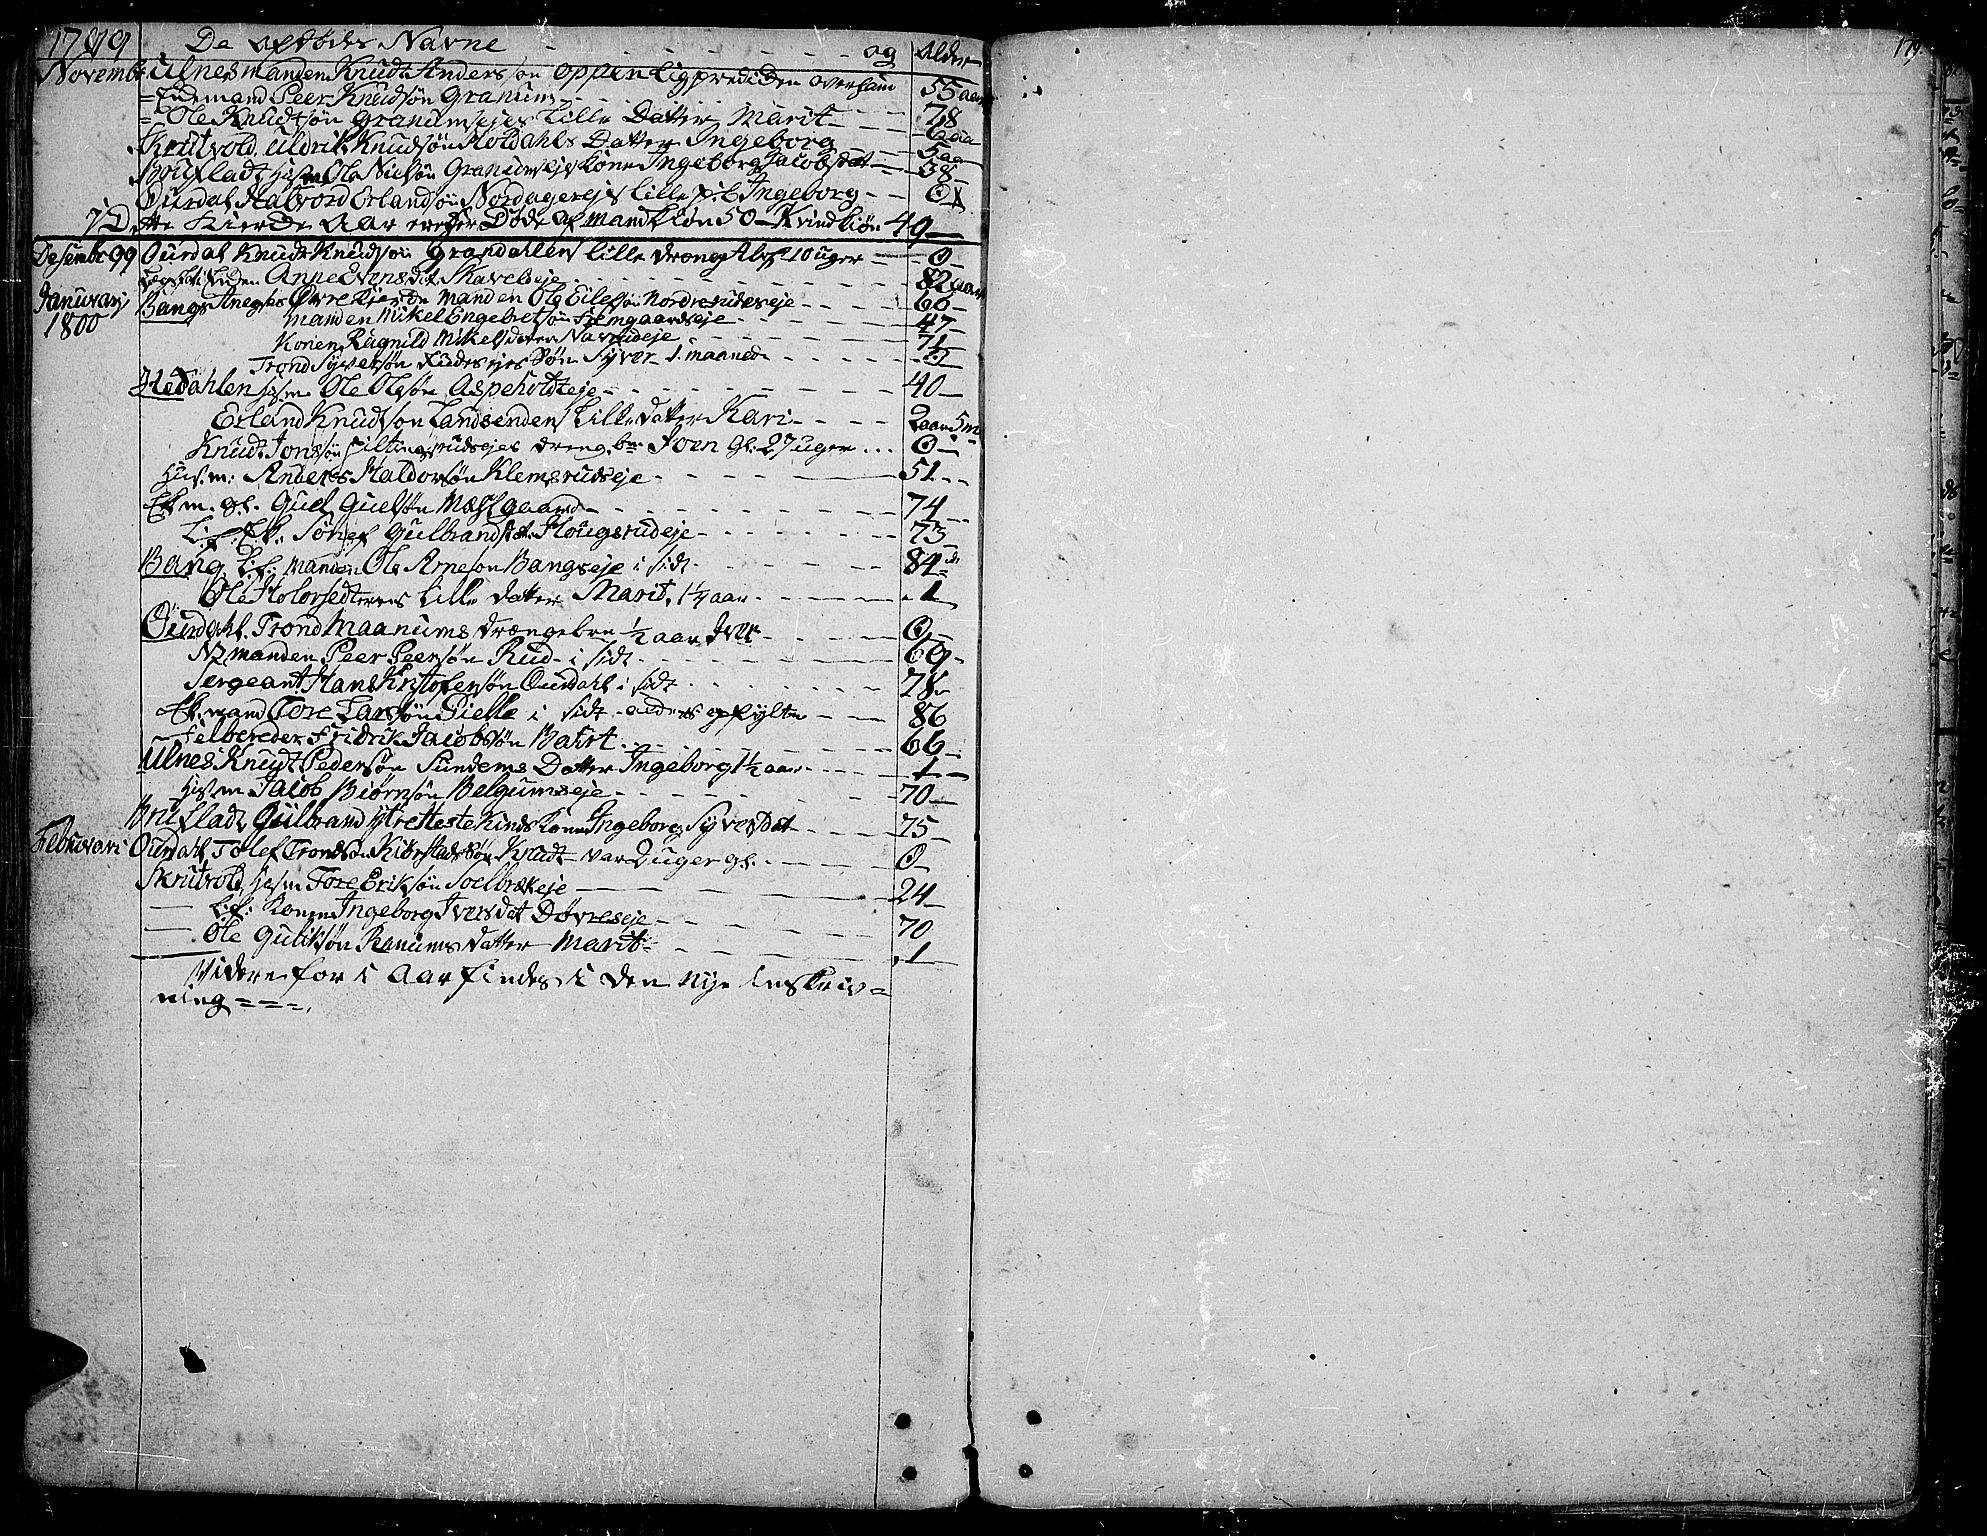 SAH, Aurdal prestekontor, Ministerialbok nr. 6, 1781-1804, s. 179